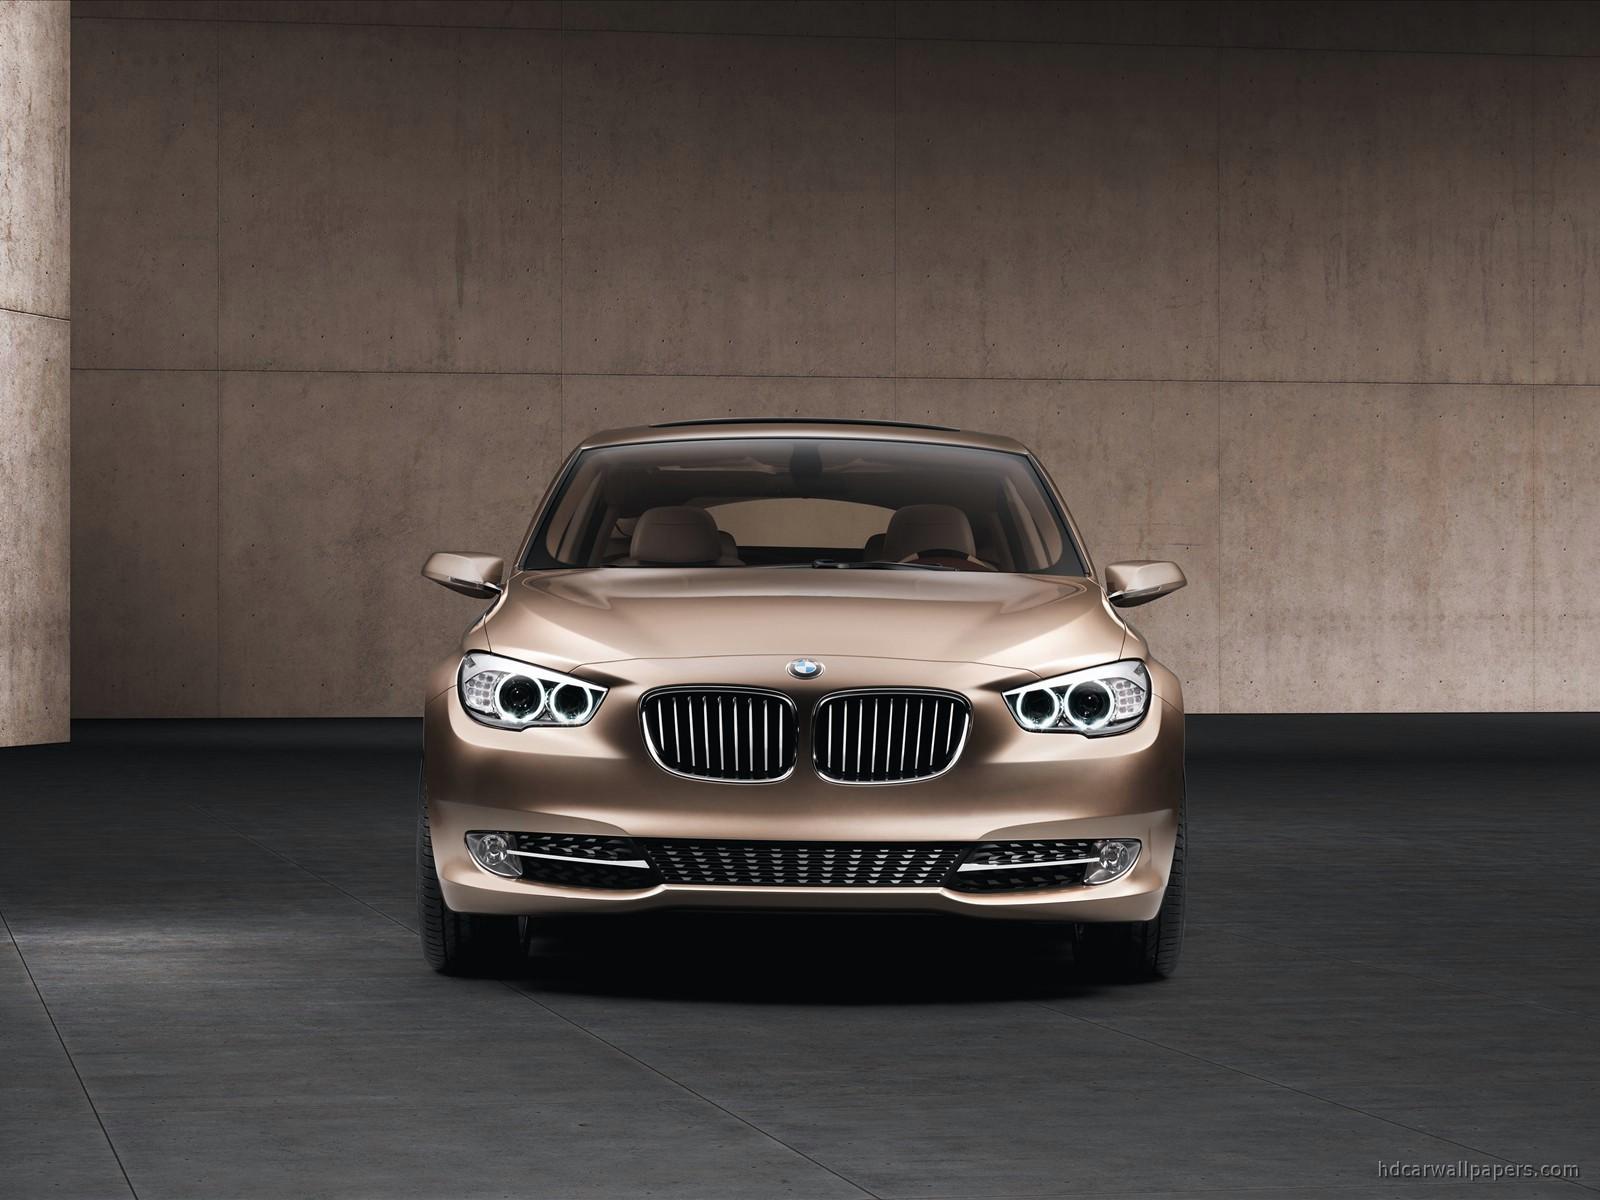 2009 BMW Concept 5 Series Gran Turismo Wallpaper | HD Car ...